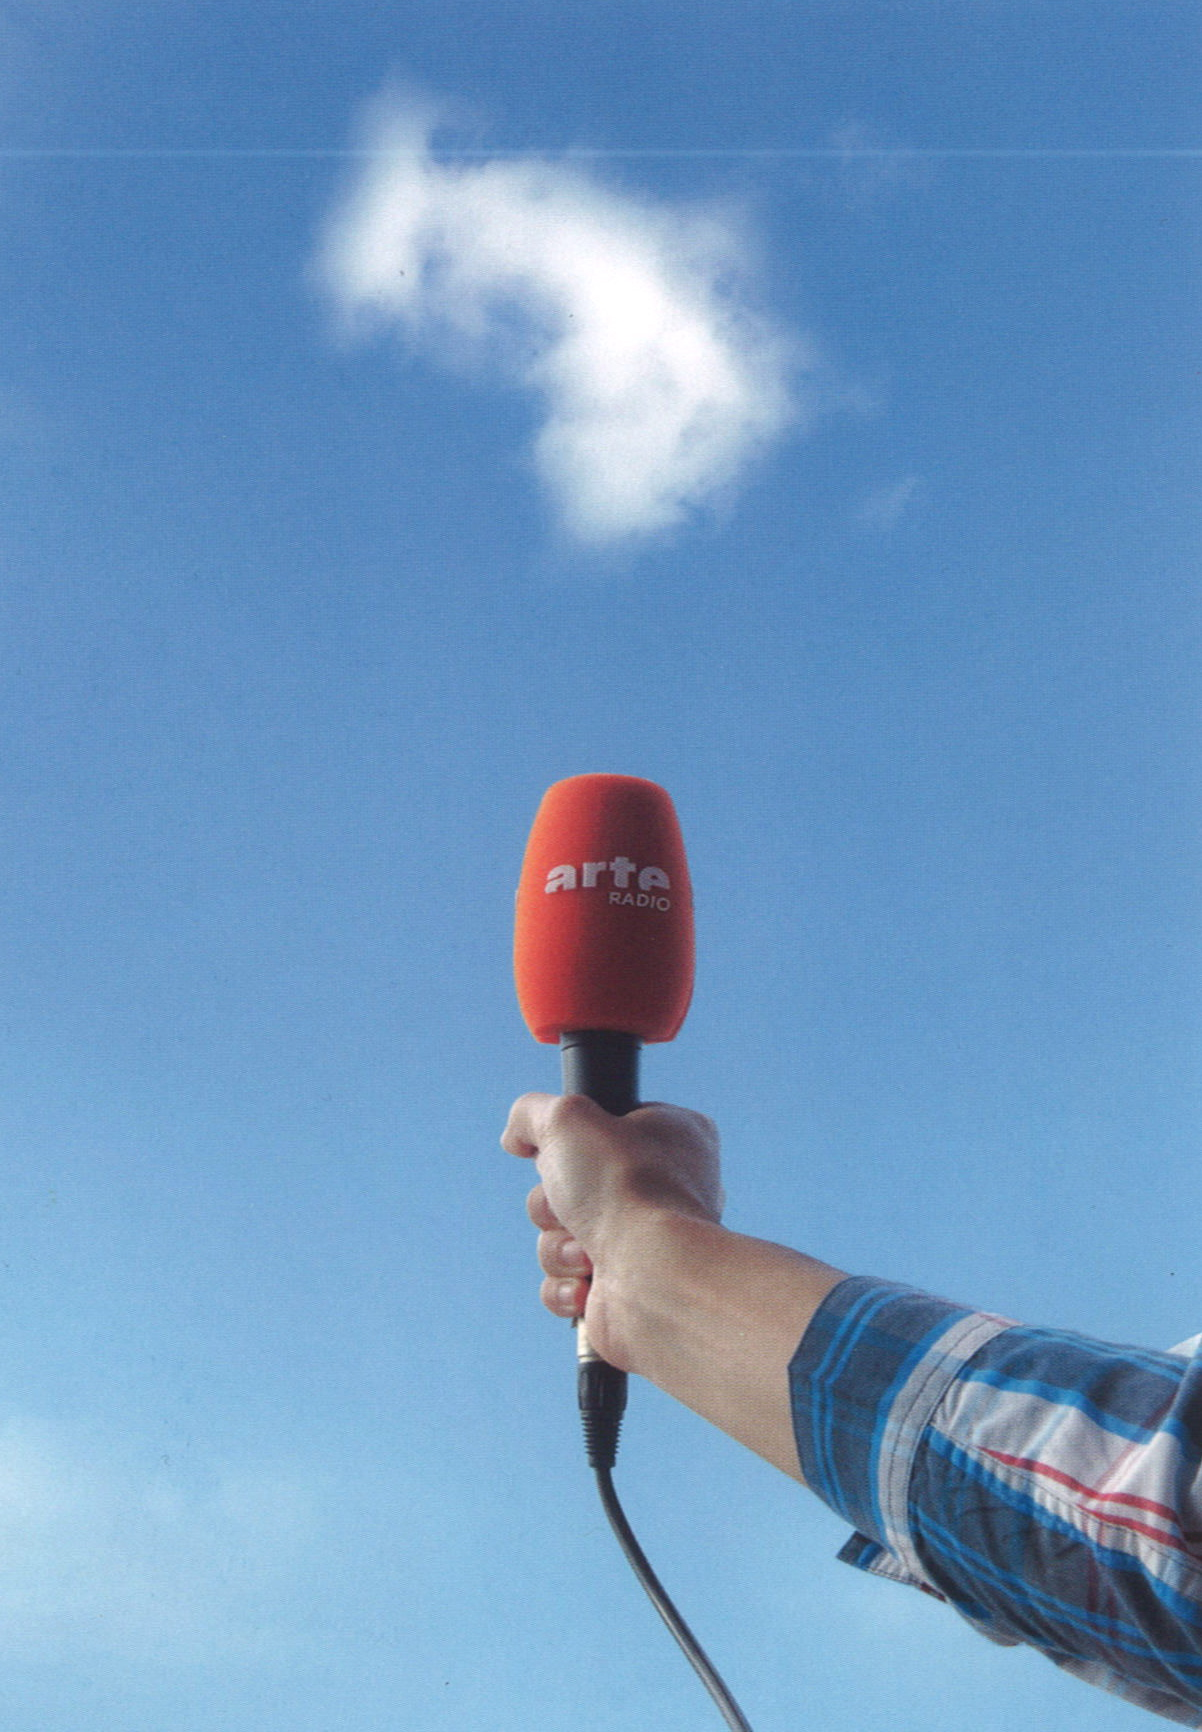 ArteRadio2.jpg